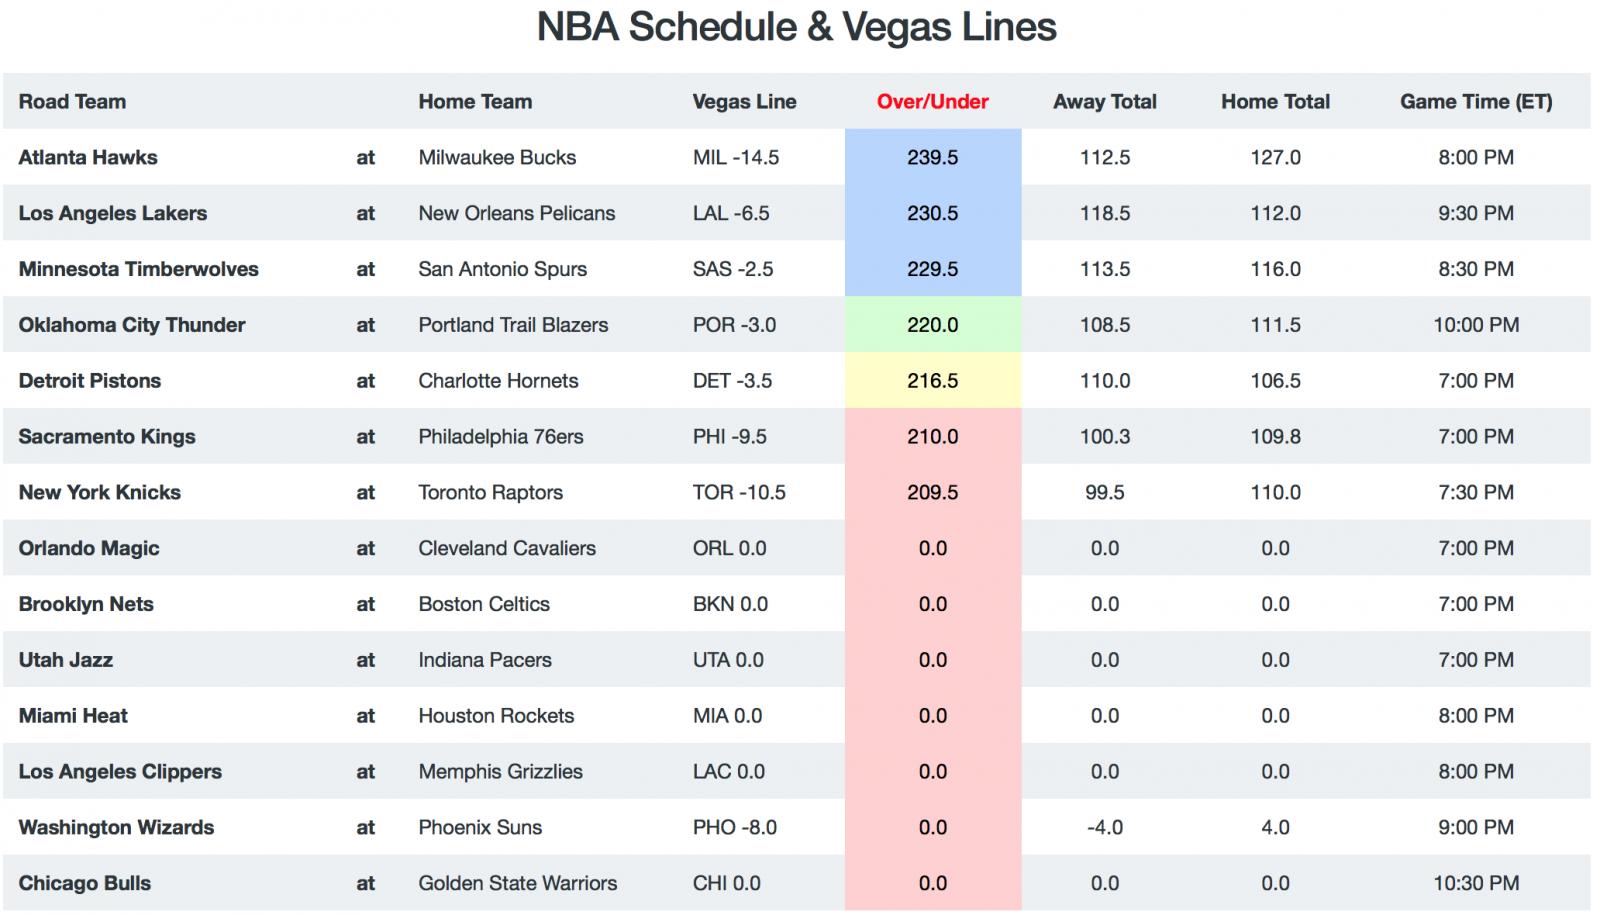 NBA Game Breakdown - Totals